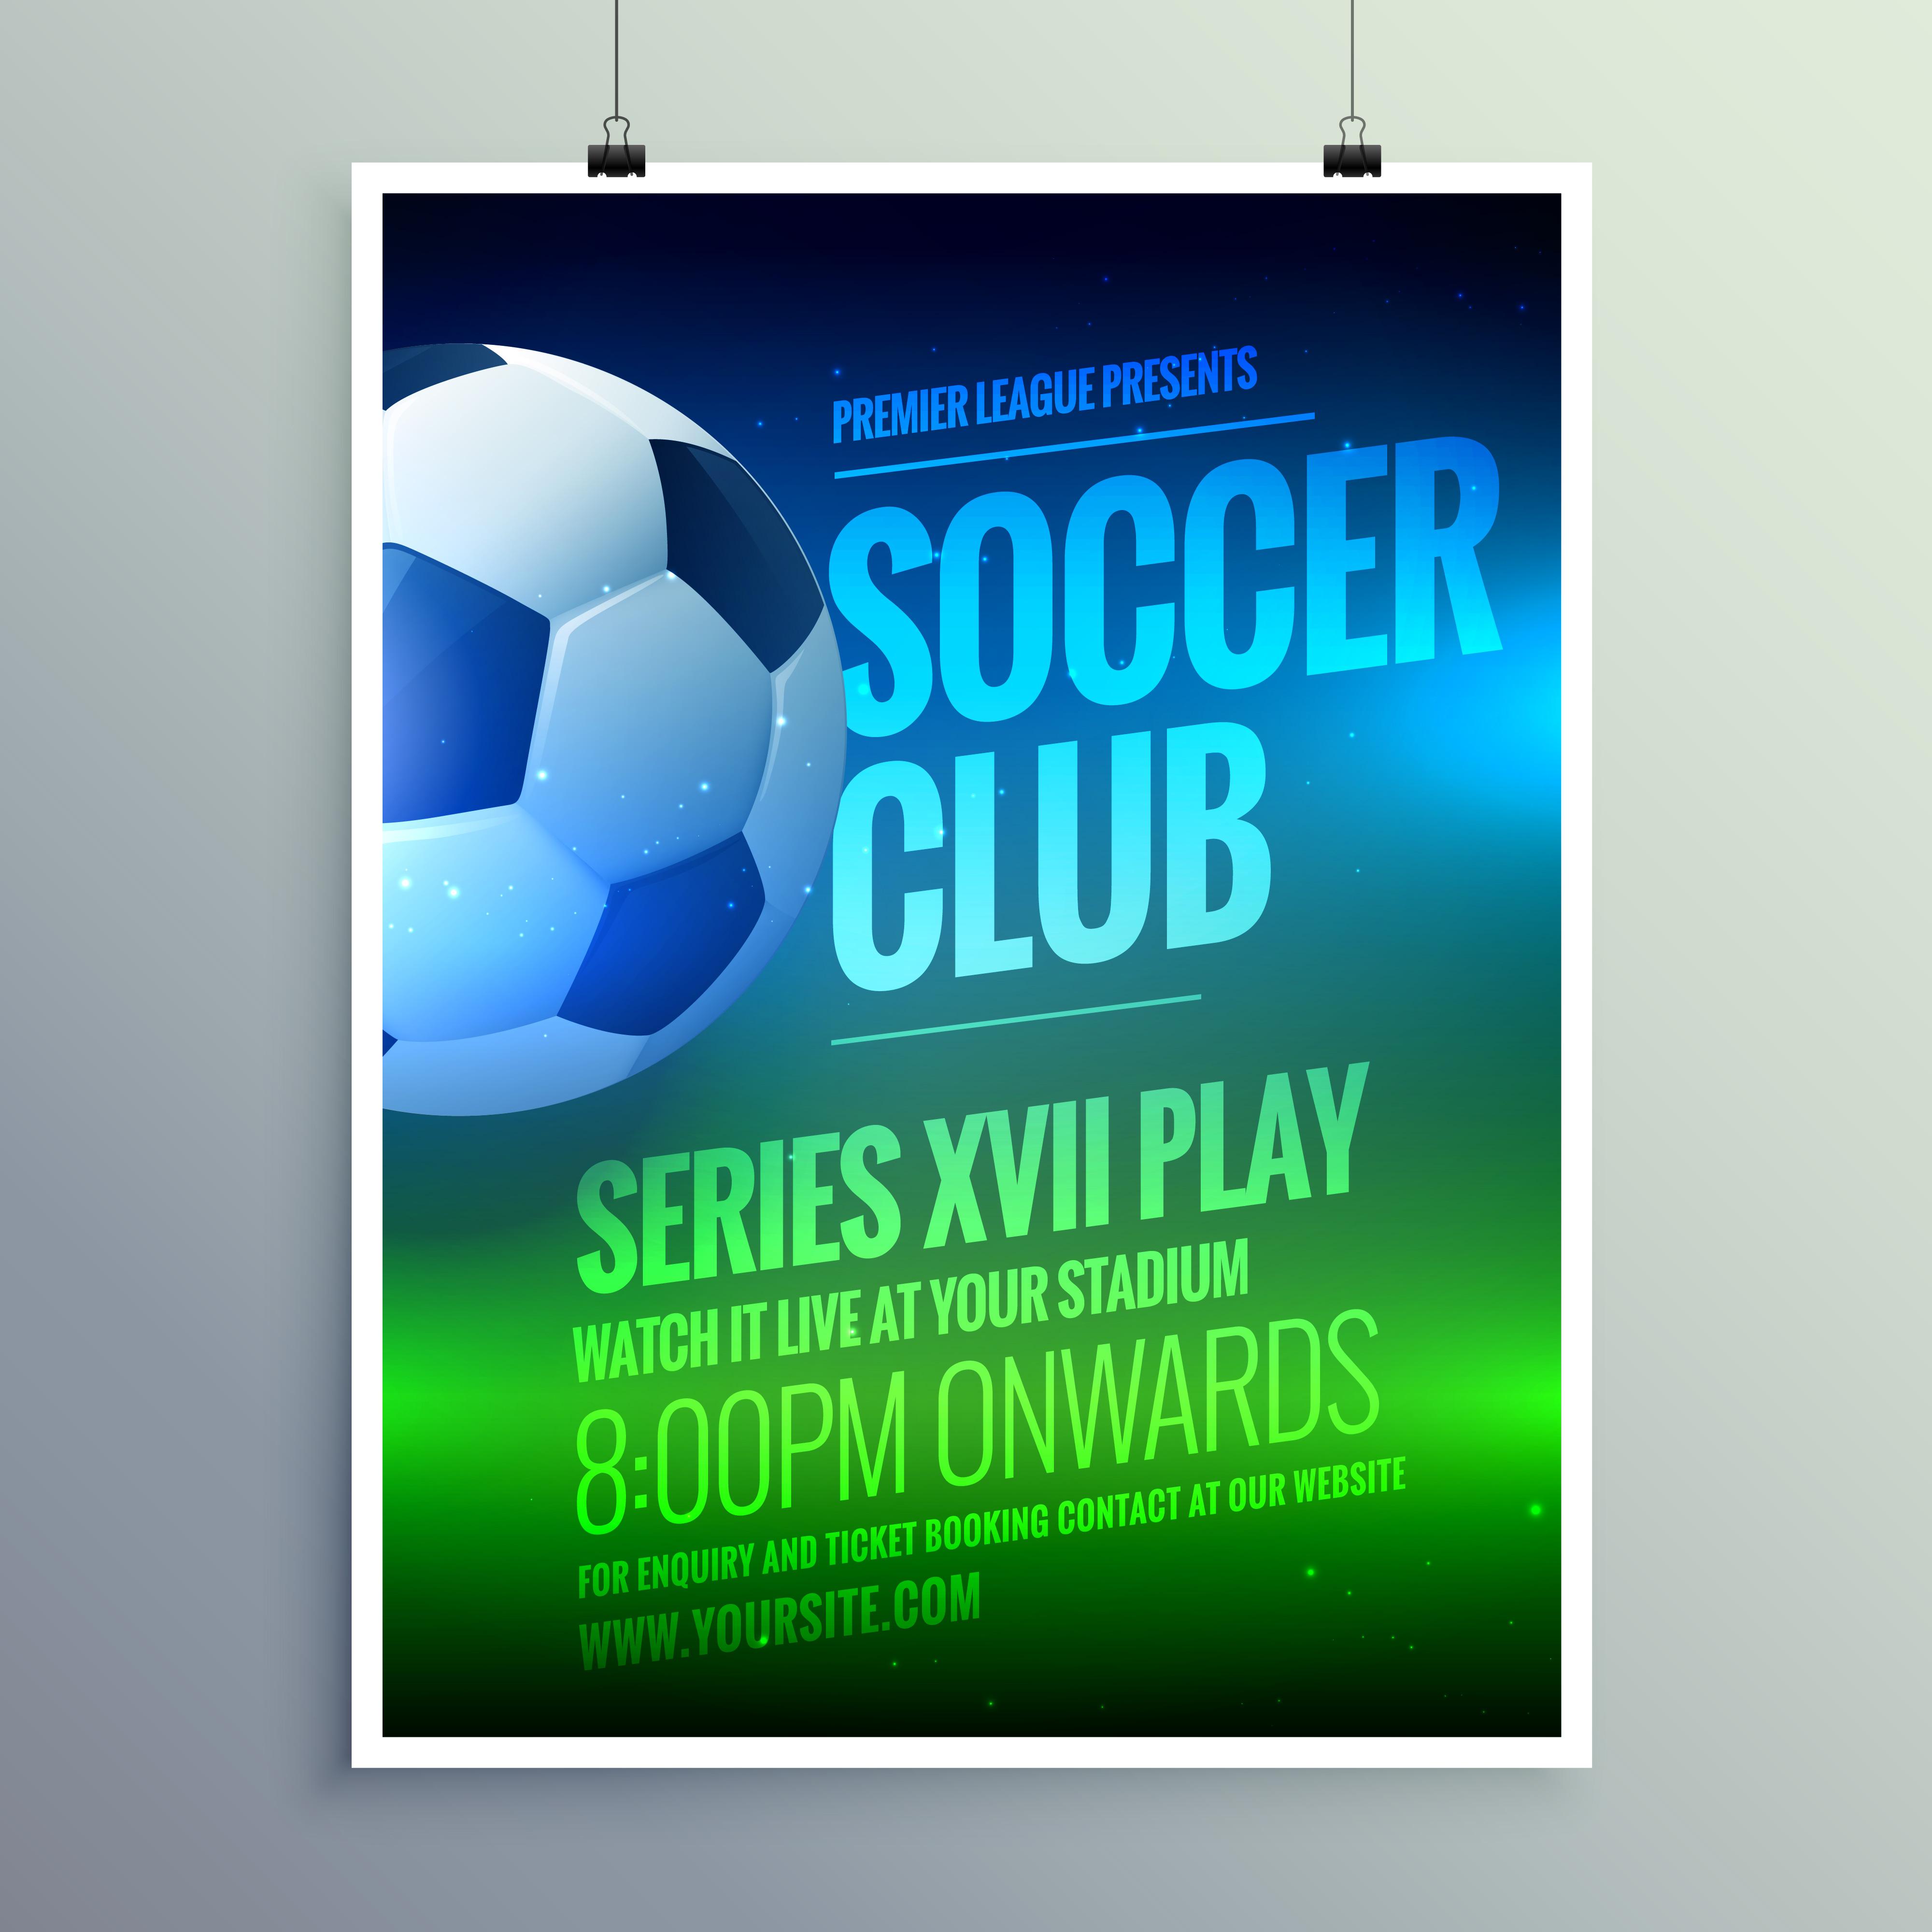 soccer invitation free vector art 7722 free downloads